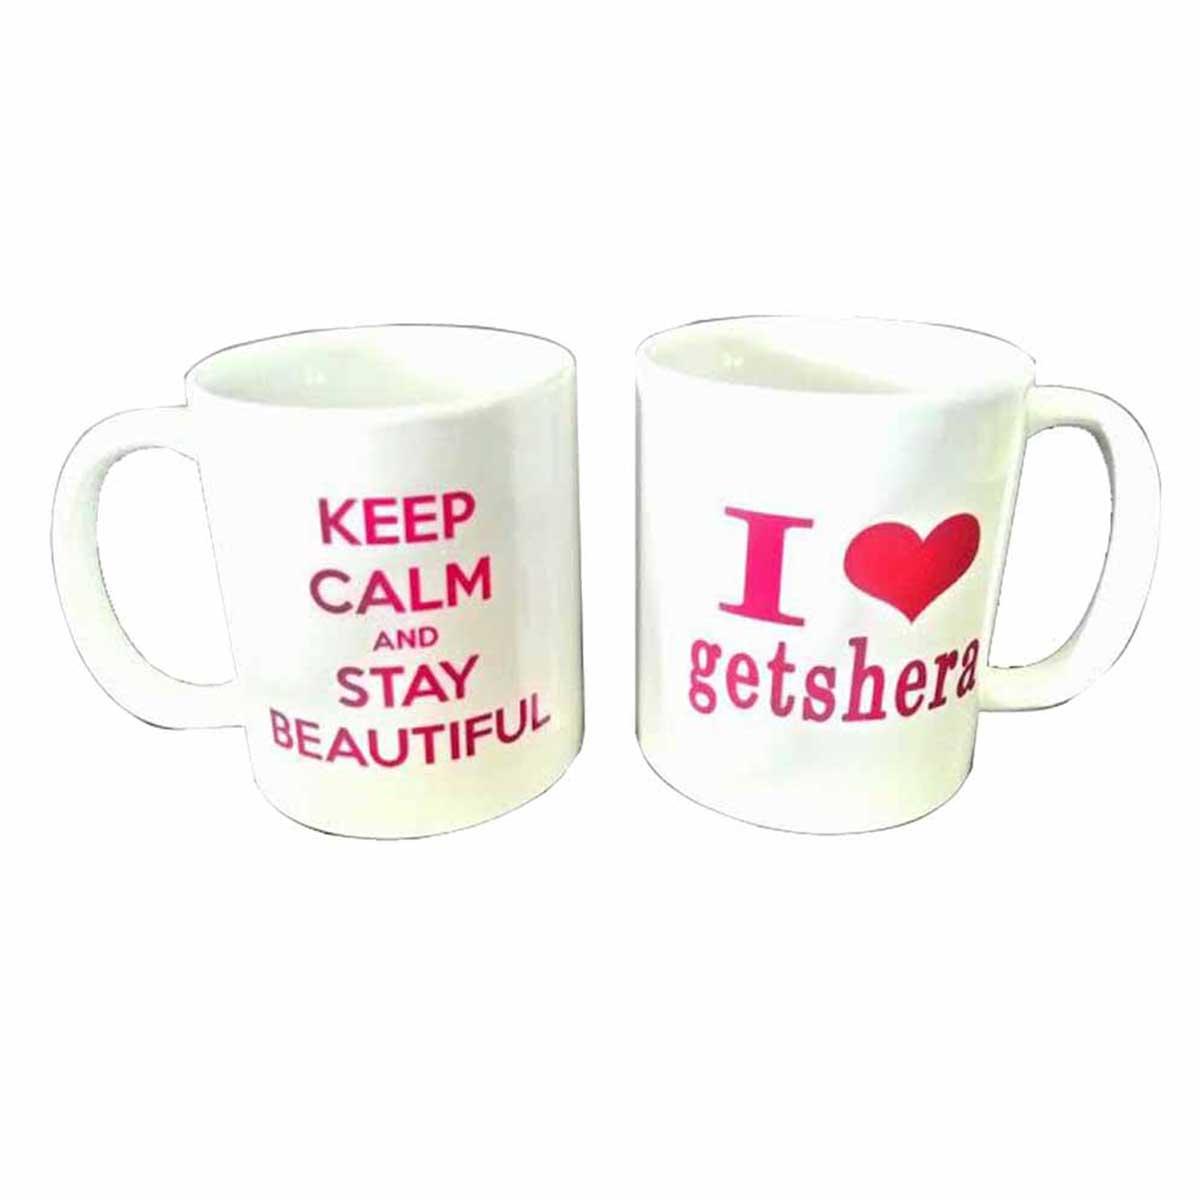 GETSHERA | Mug